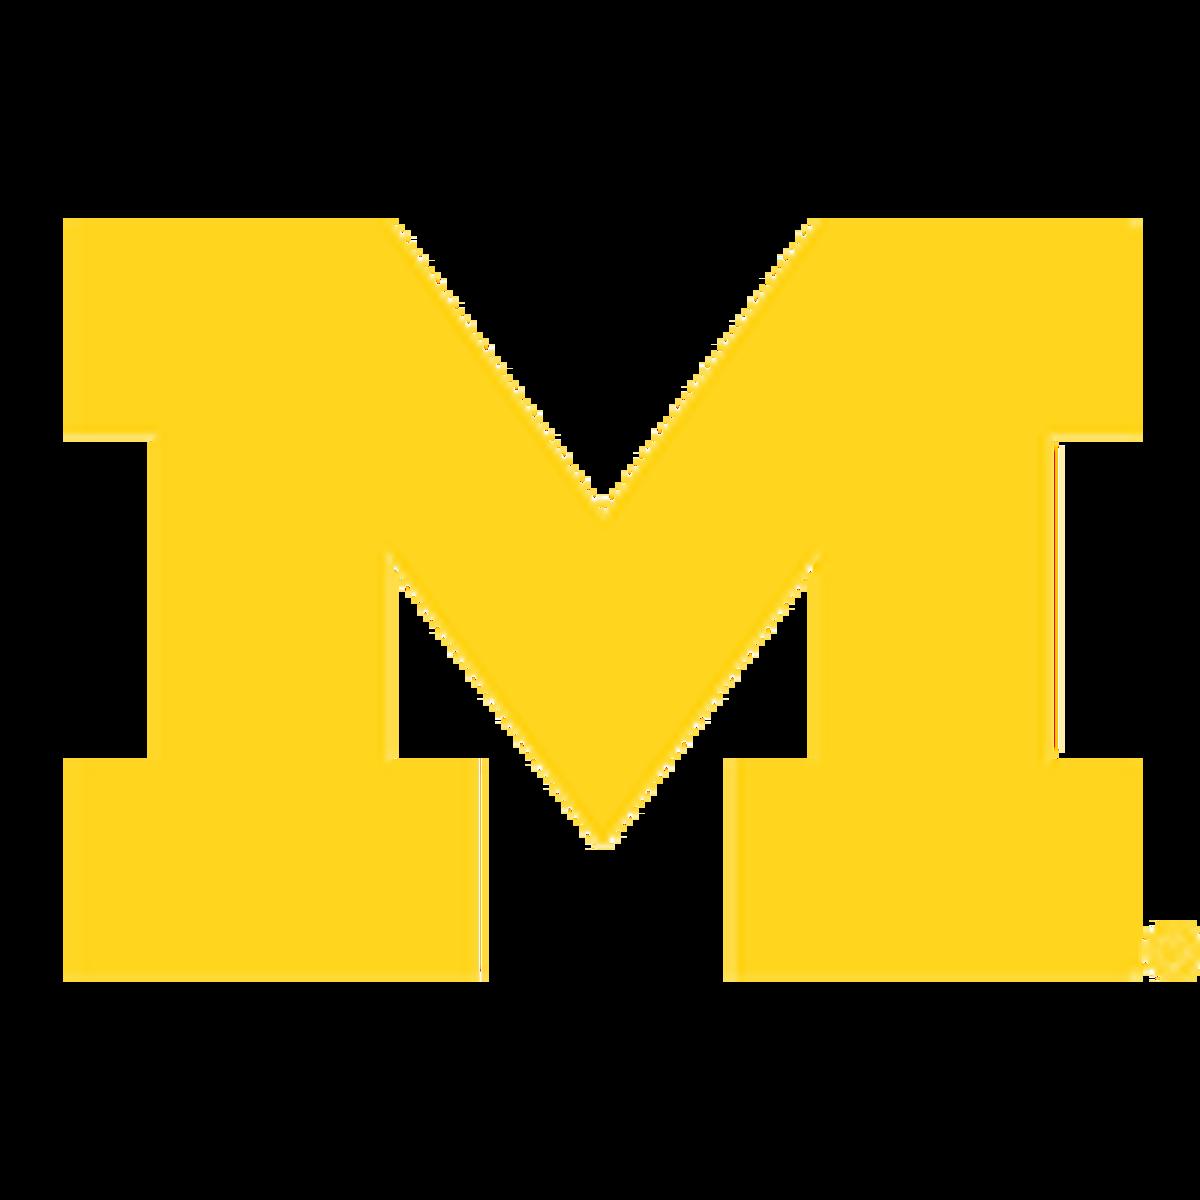 College Football Top 25 Rankings: Michigan